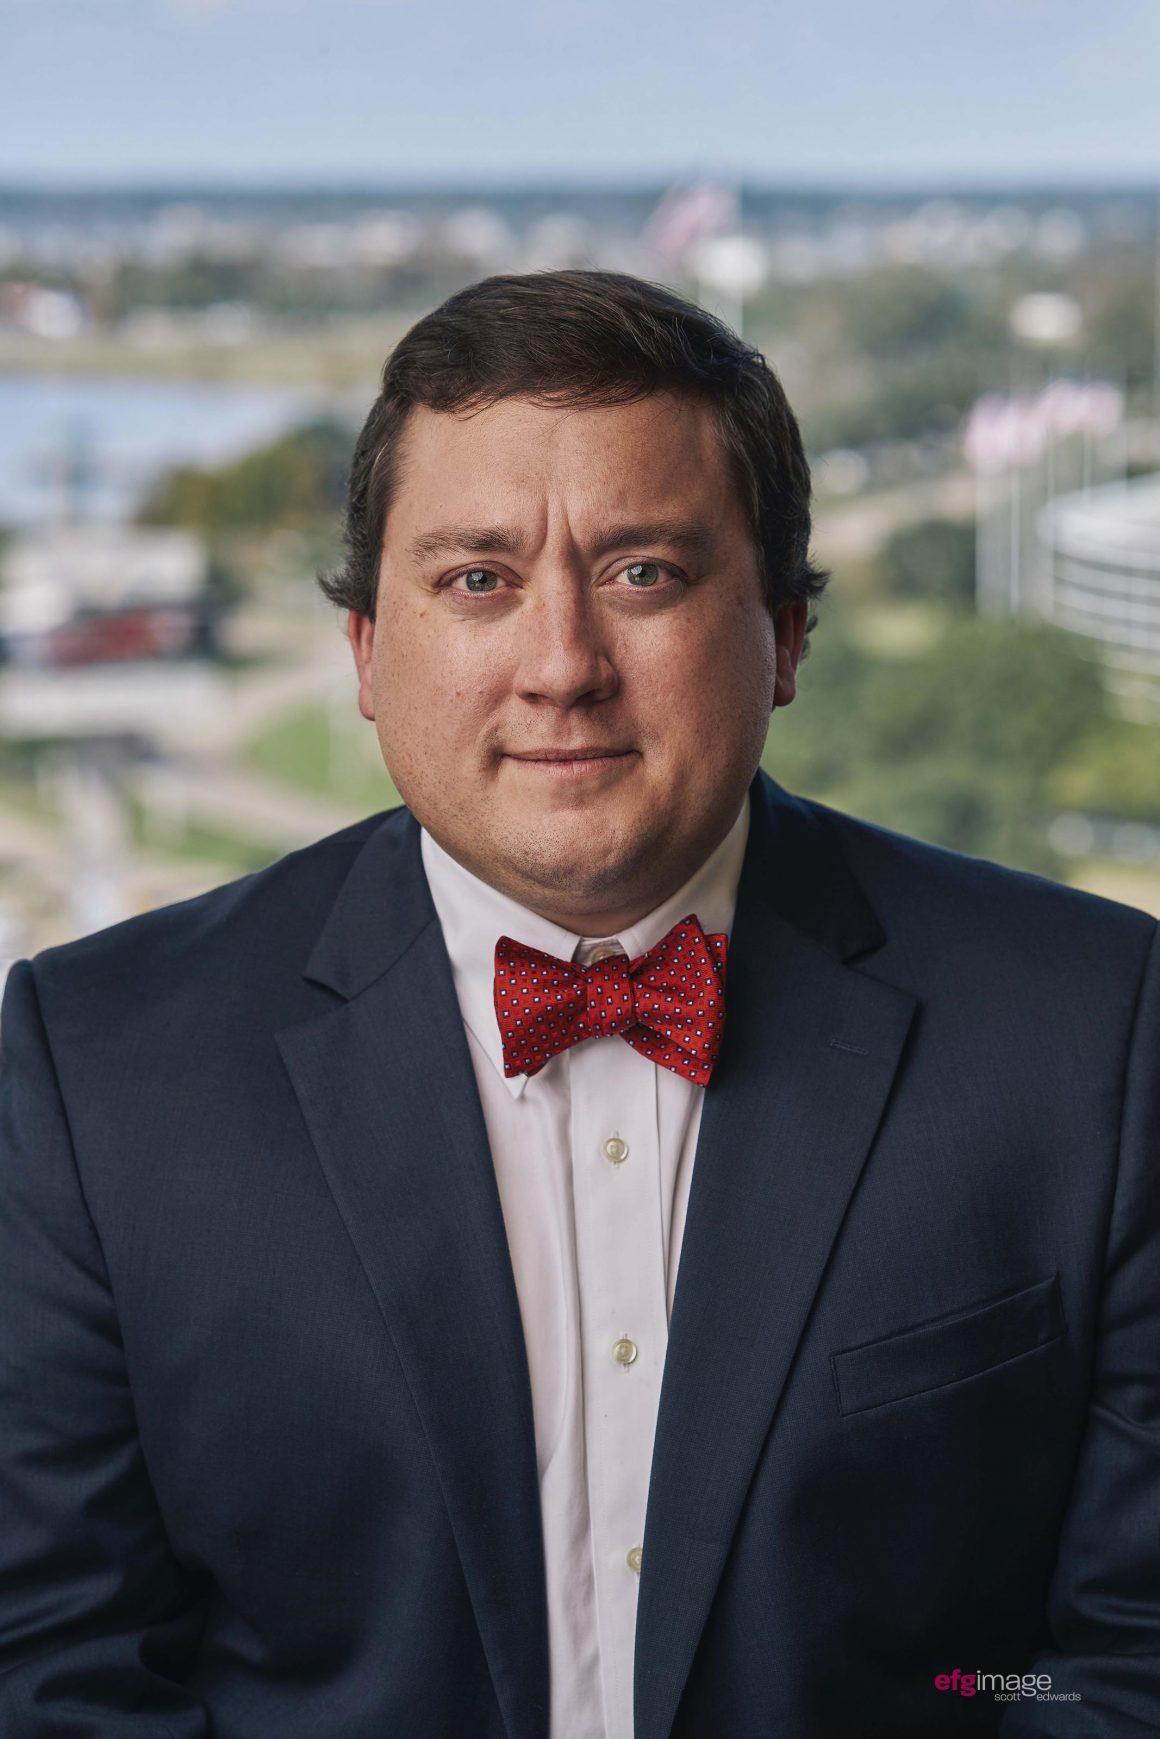 Peter Pohorelsky